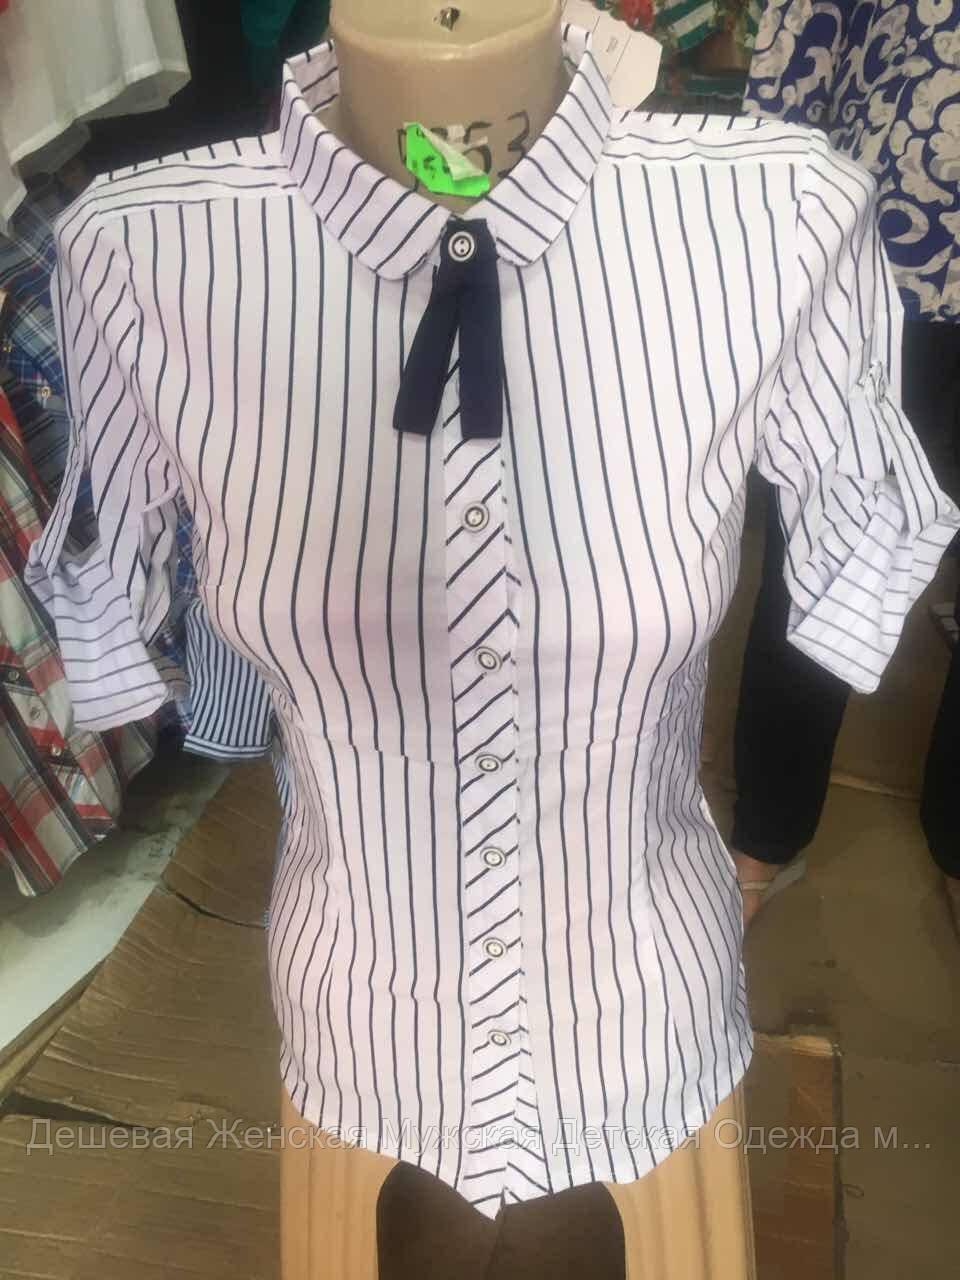 Жіноча стильна сорочка оптом